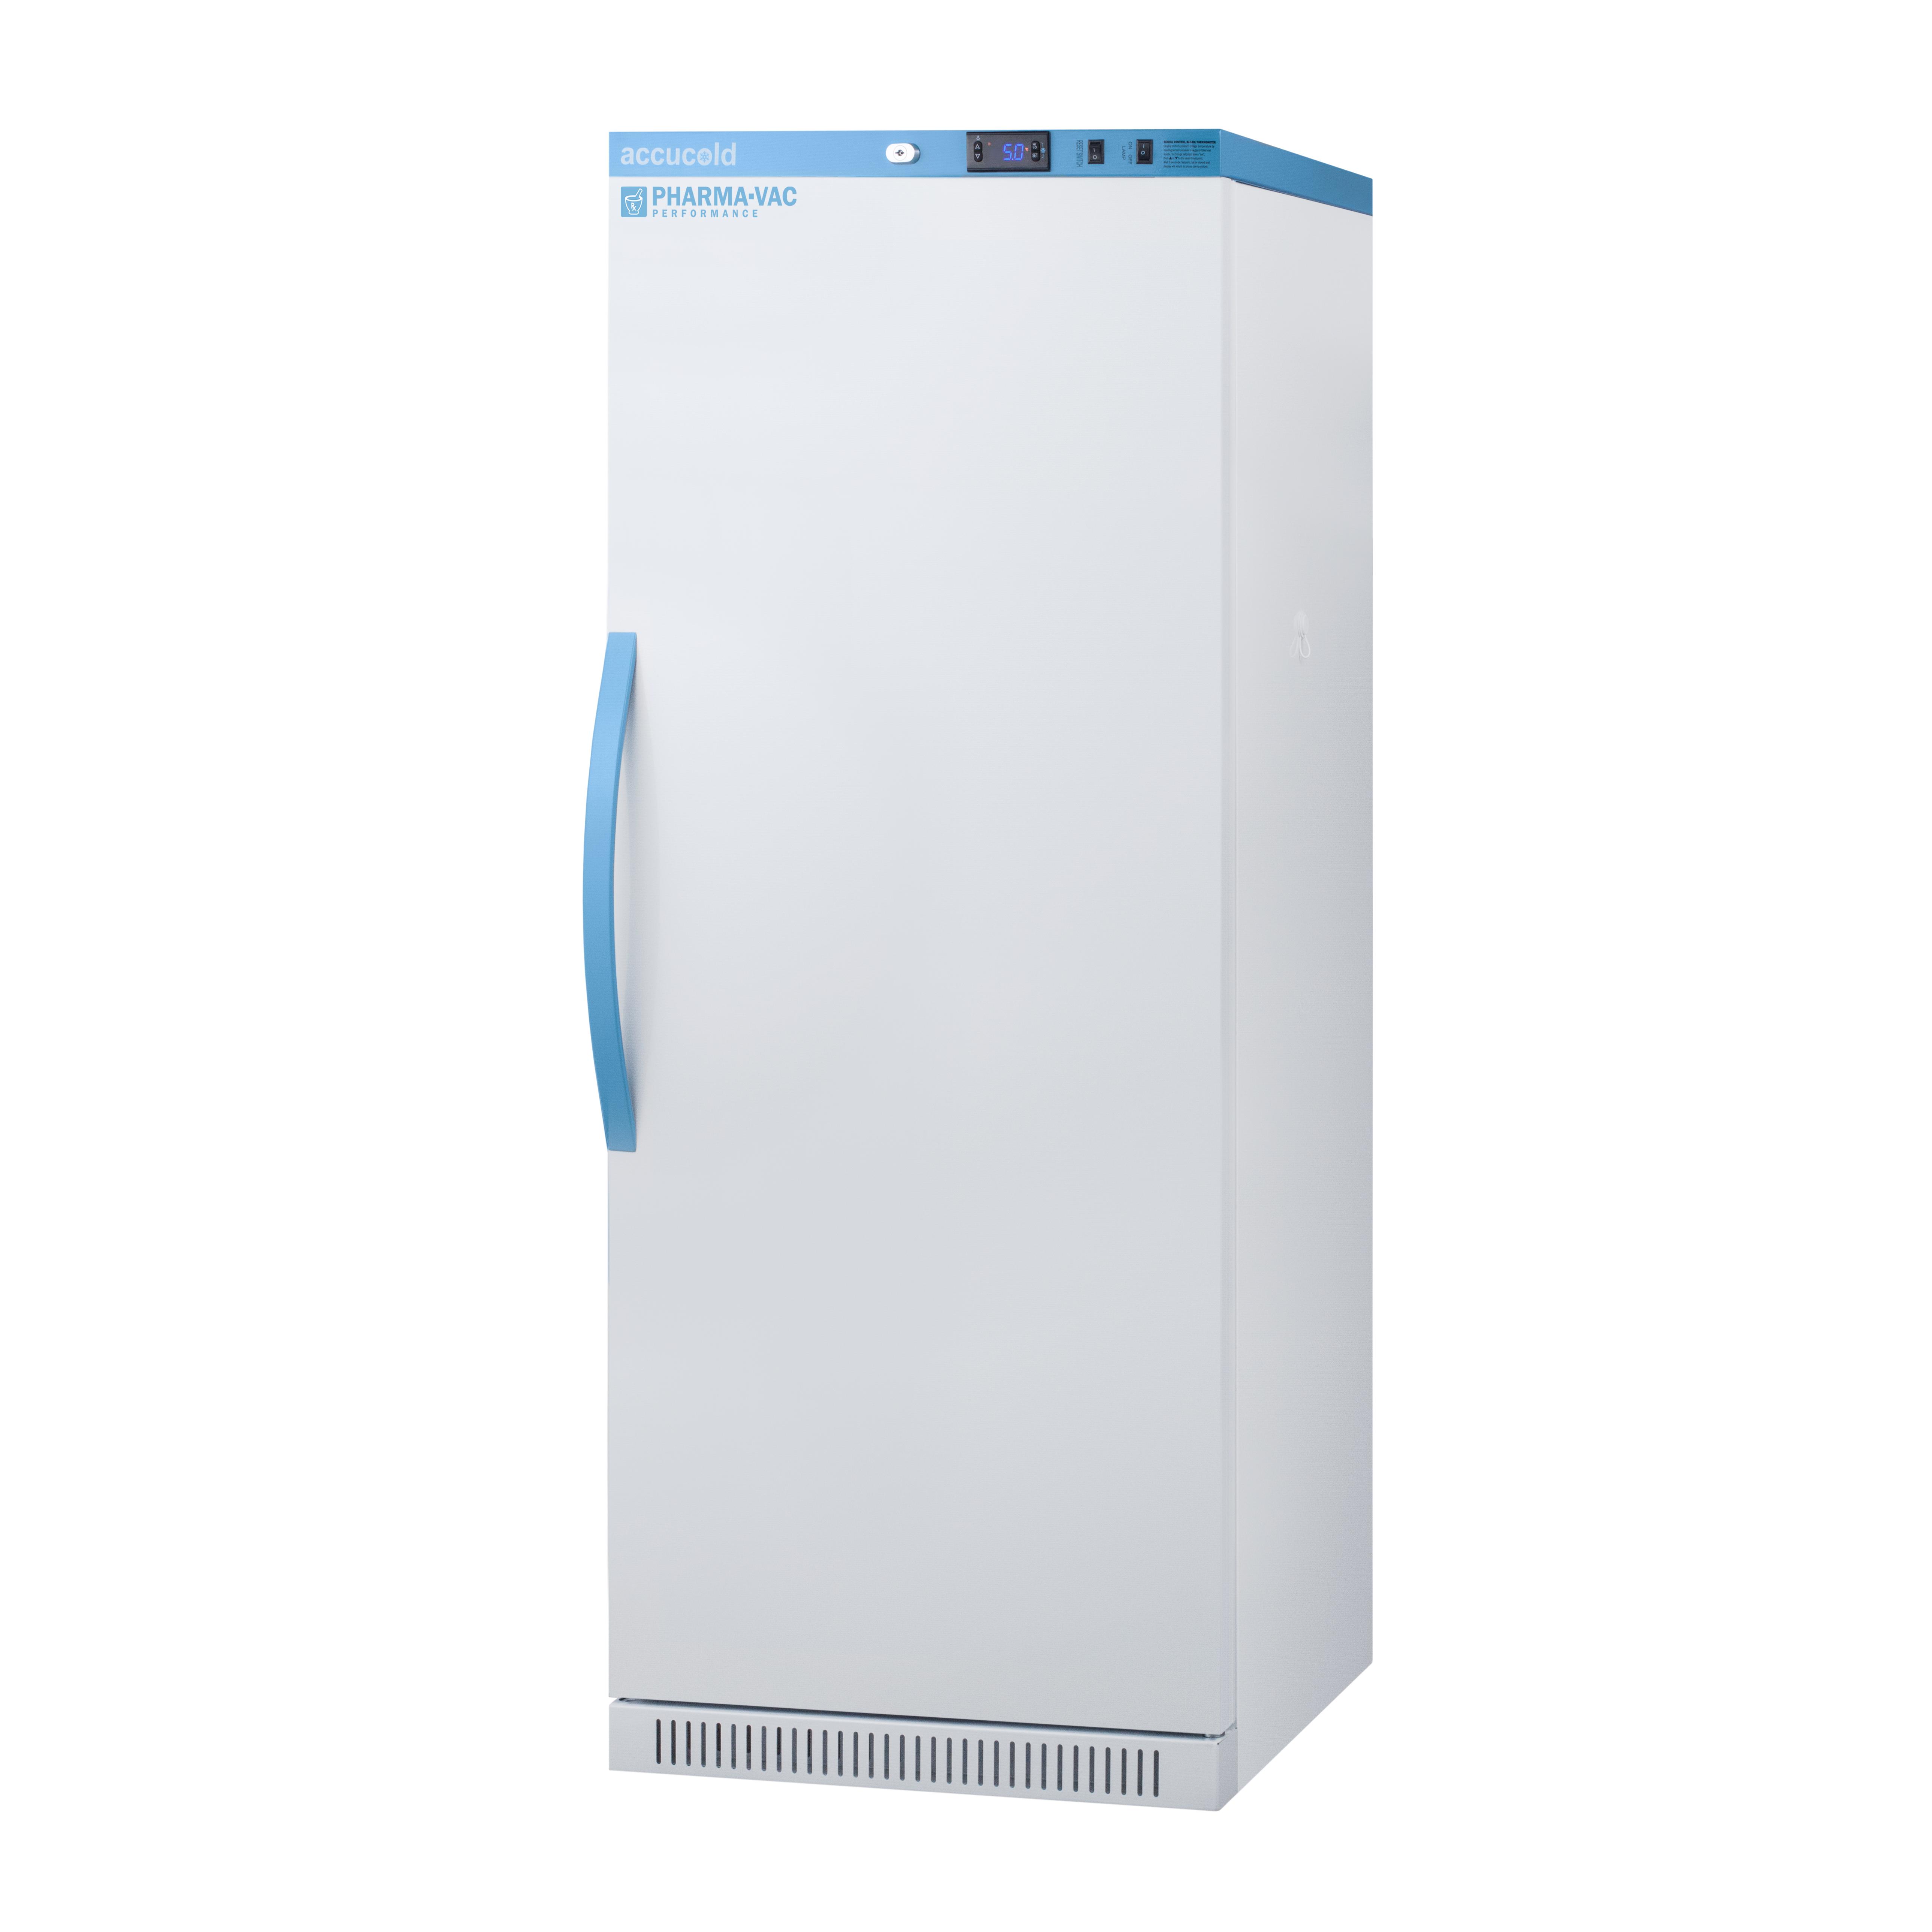 Summit Appliance ARS12PV refrigerator, medical